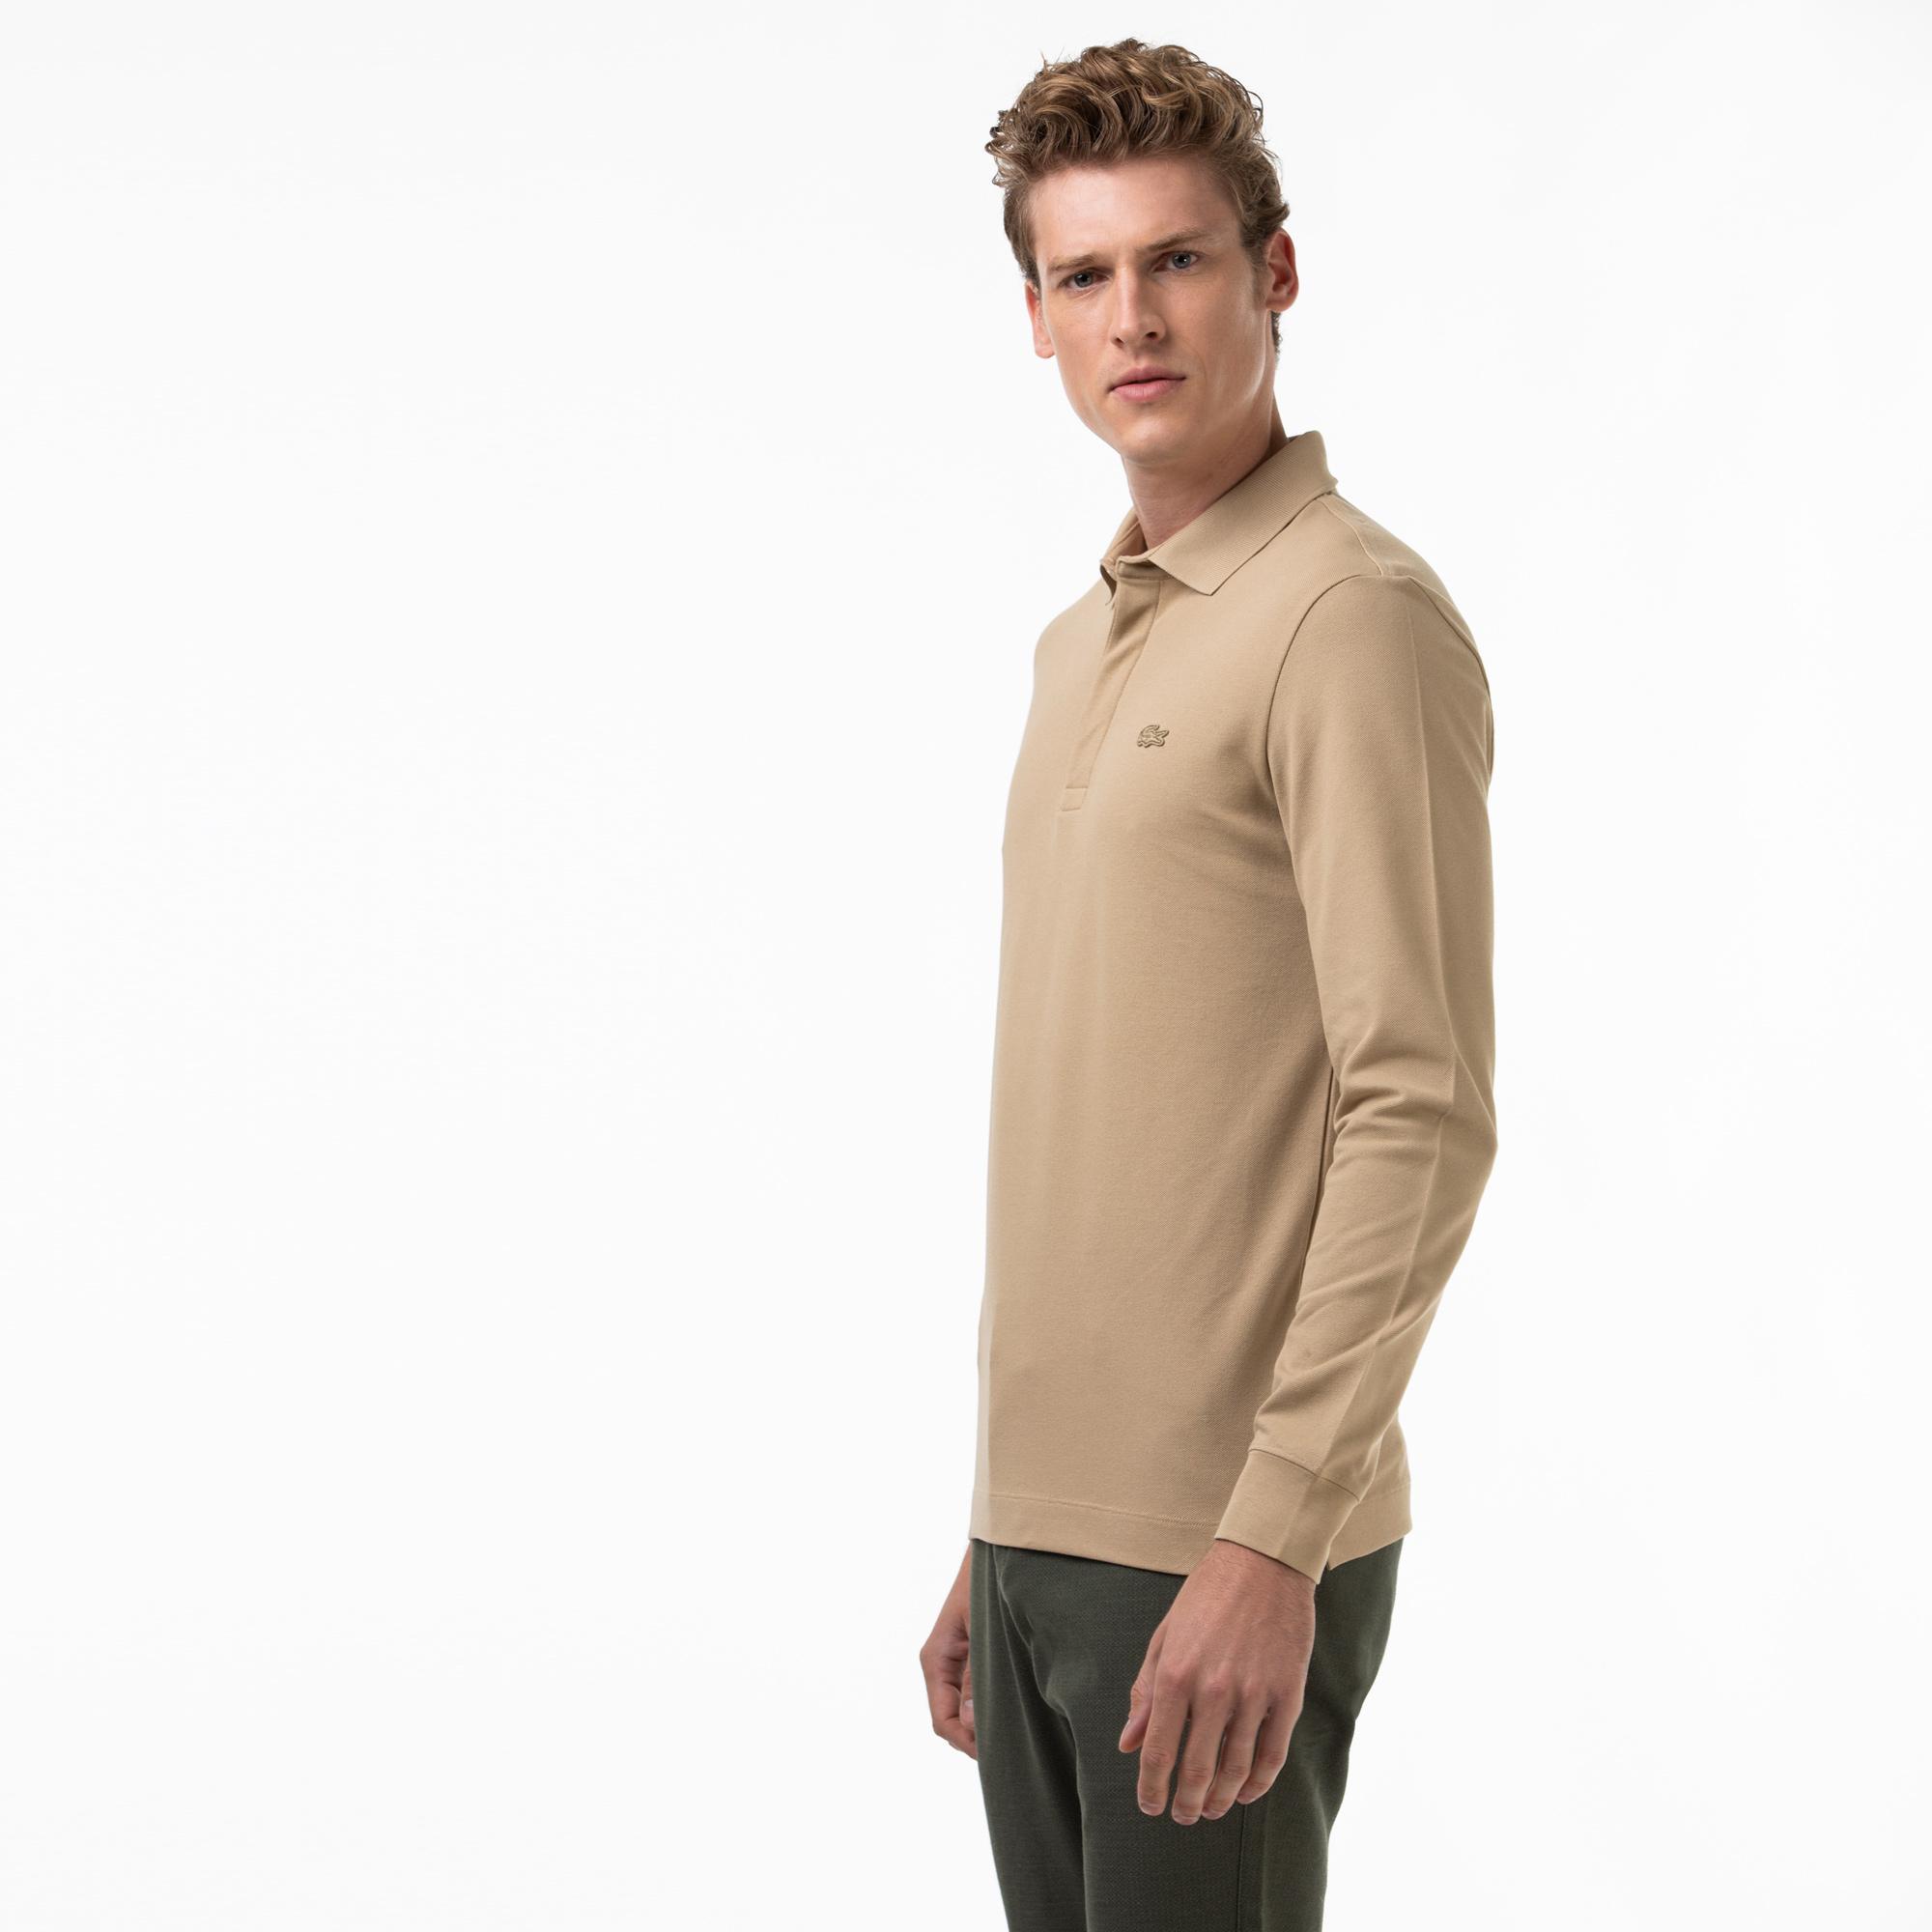 Lacoste Koszula Polo Męska Regular Fit